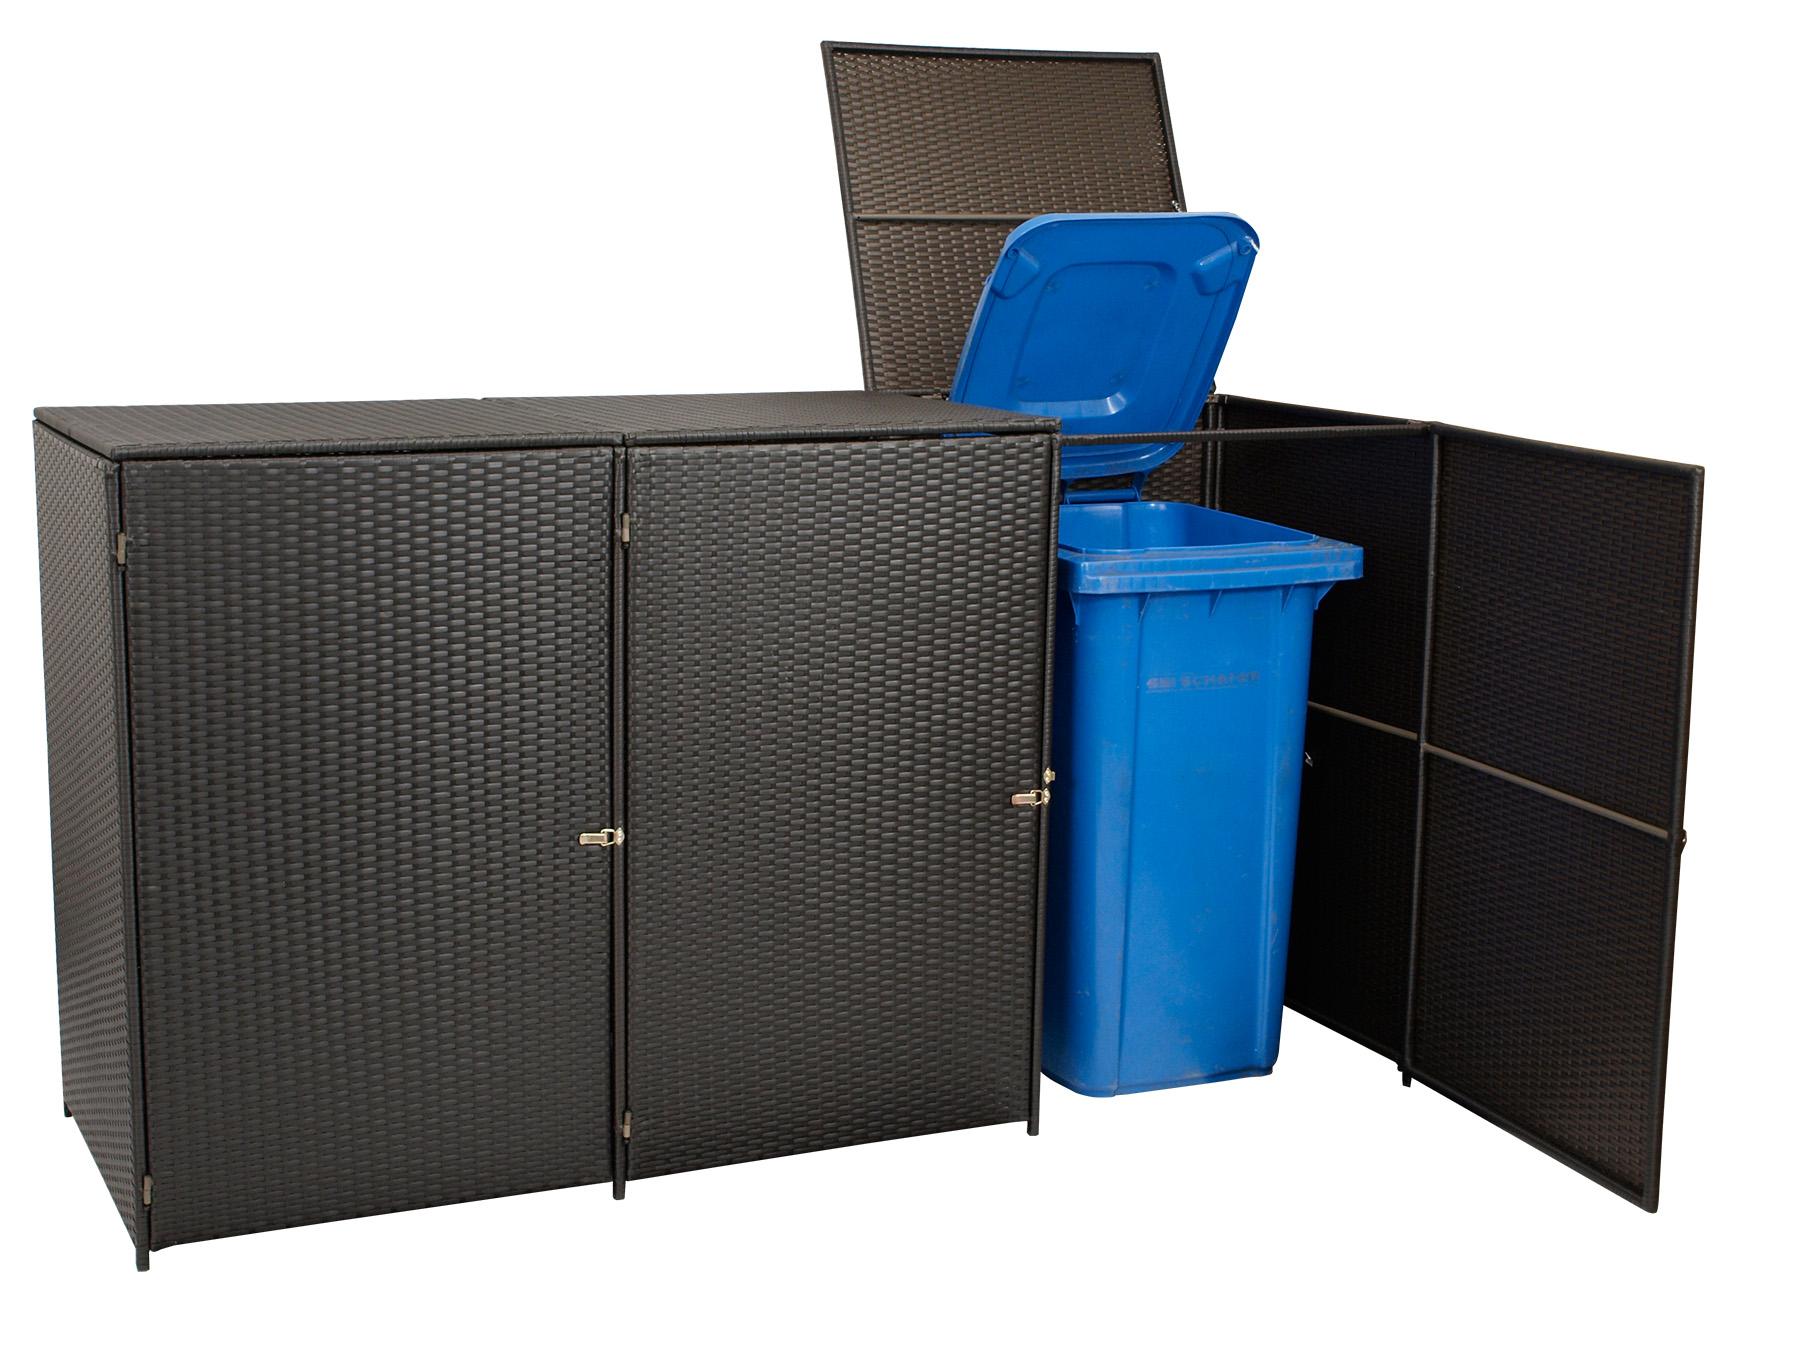 m lltonnenbox 3er m lltonnenhaus 3 er bis 120 liter 129x66x109cm rattan braun ebay. Black Bedroom Furniture Sets. Home Design Ideas